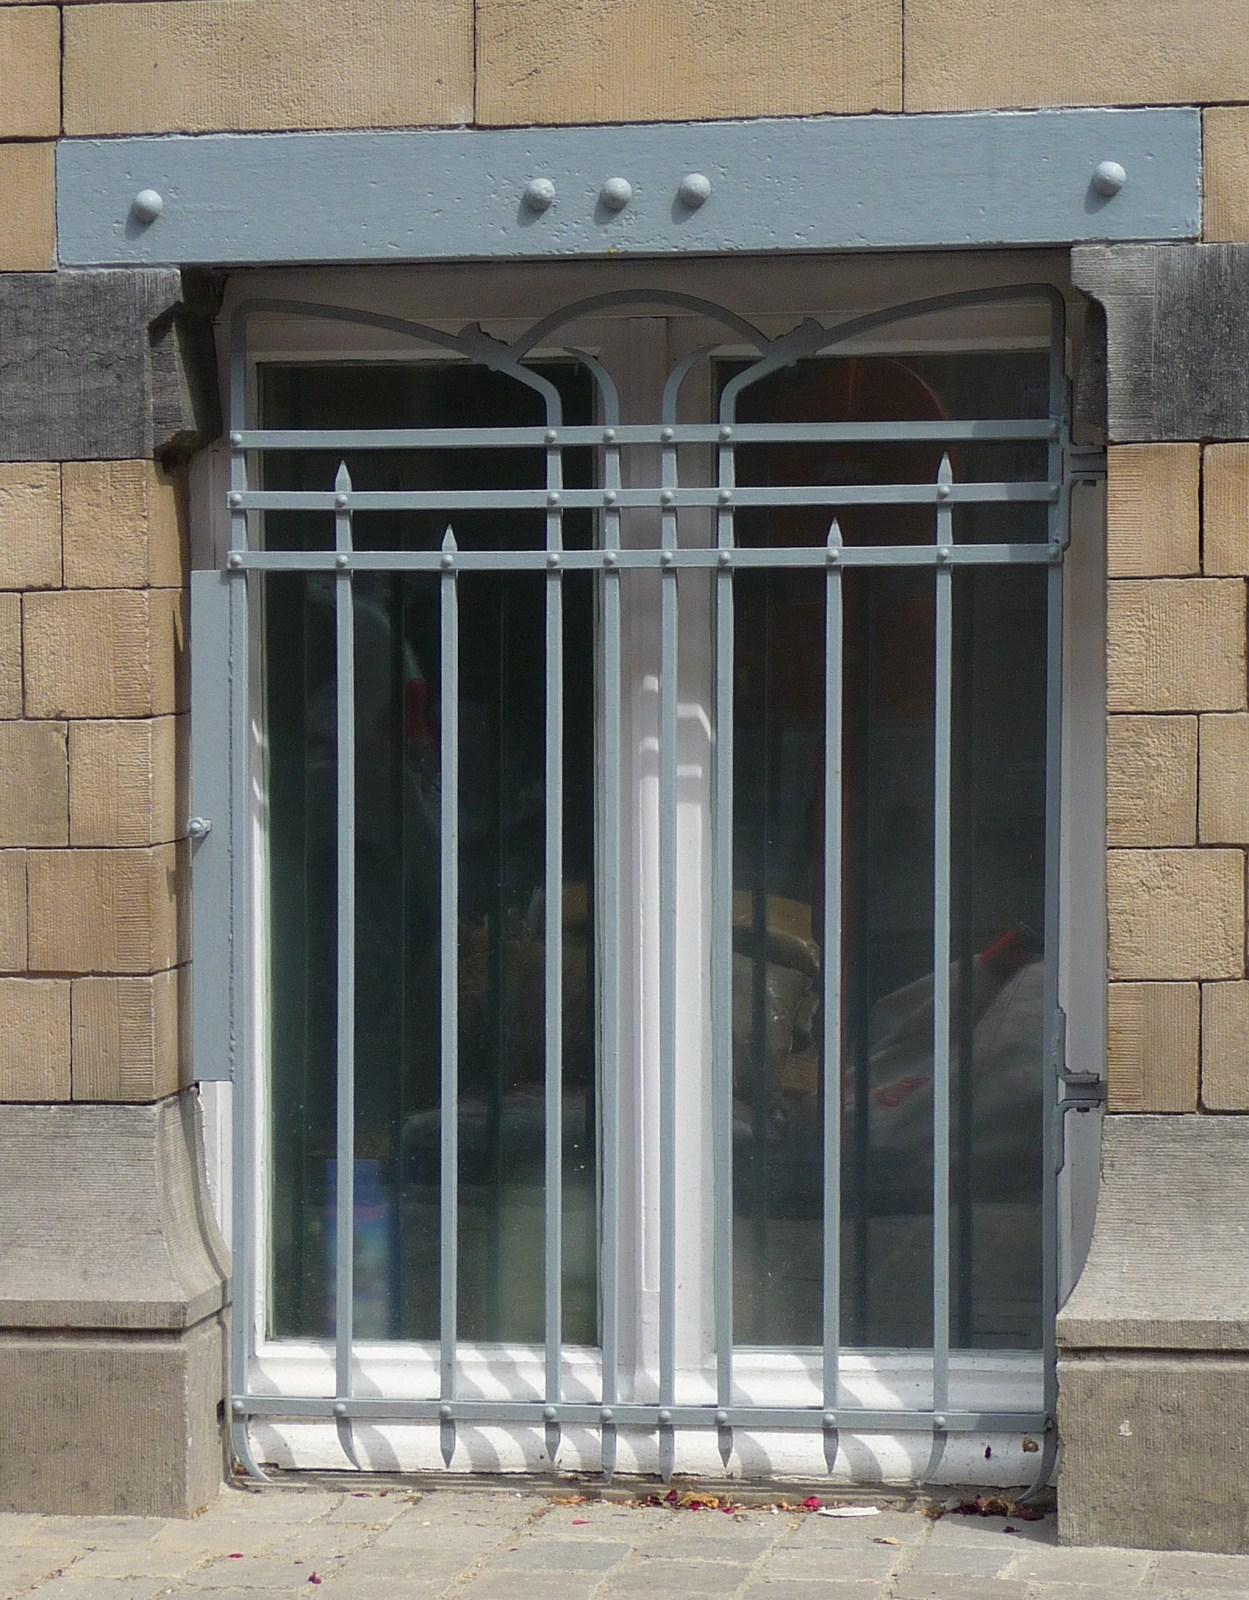 bruxelles extension est rue murillo 25 27 29 31 33 35 35a 37 evrard auguste. Black Bedroom Furniture Sets. Home Design Ideas